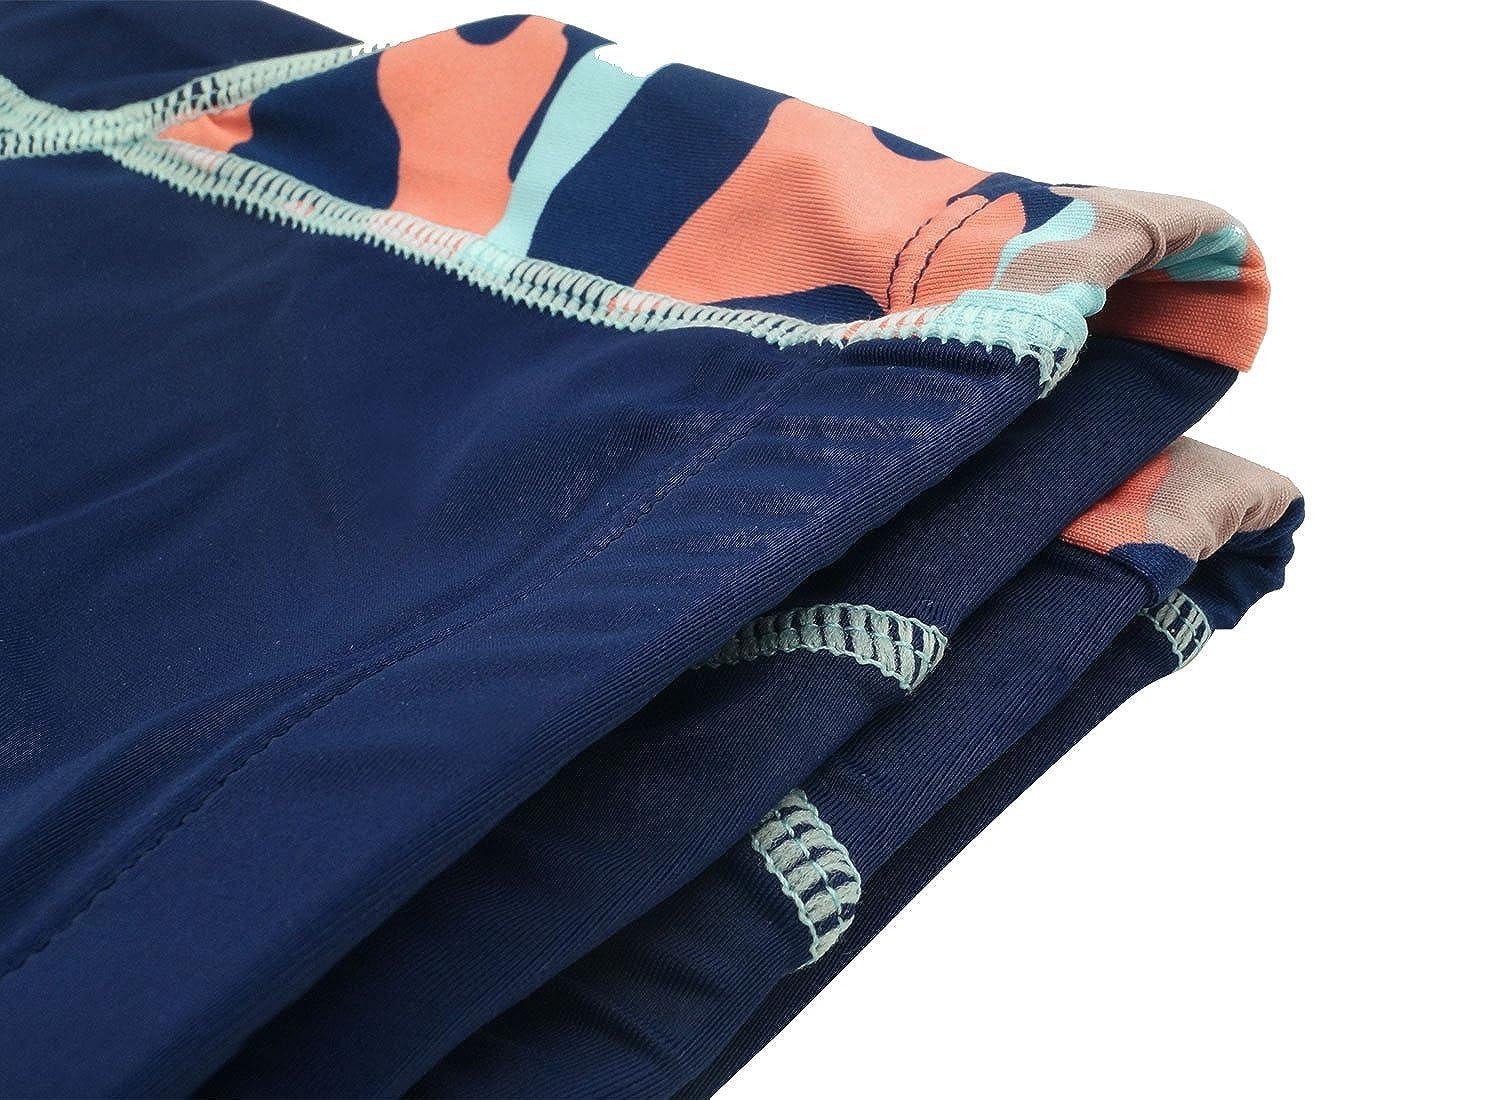 Aivtalk Boys Swimming Trunks Drawstring Mesh Lined Quick Dry Boxer Briefs 4-8T